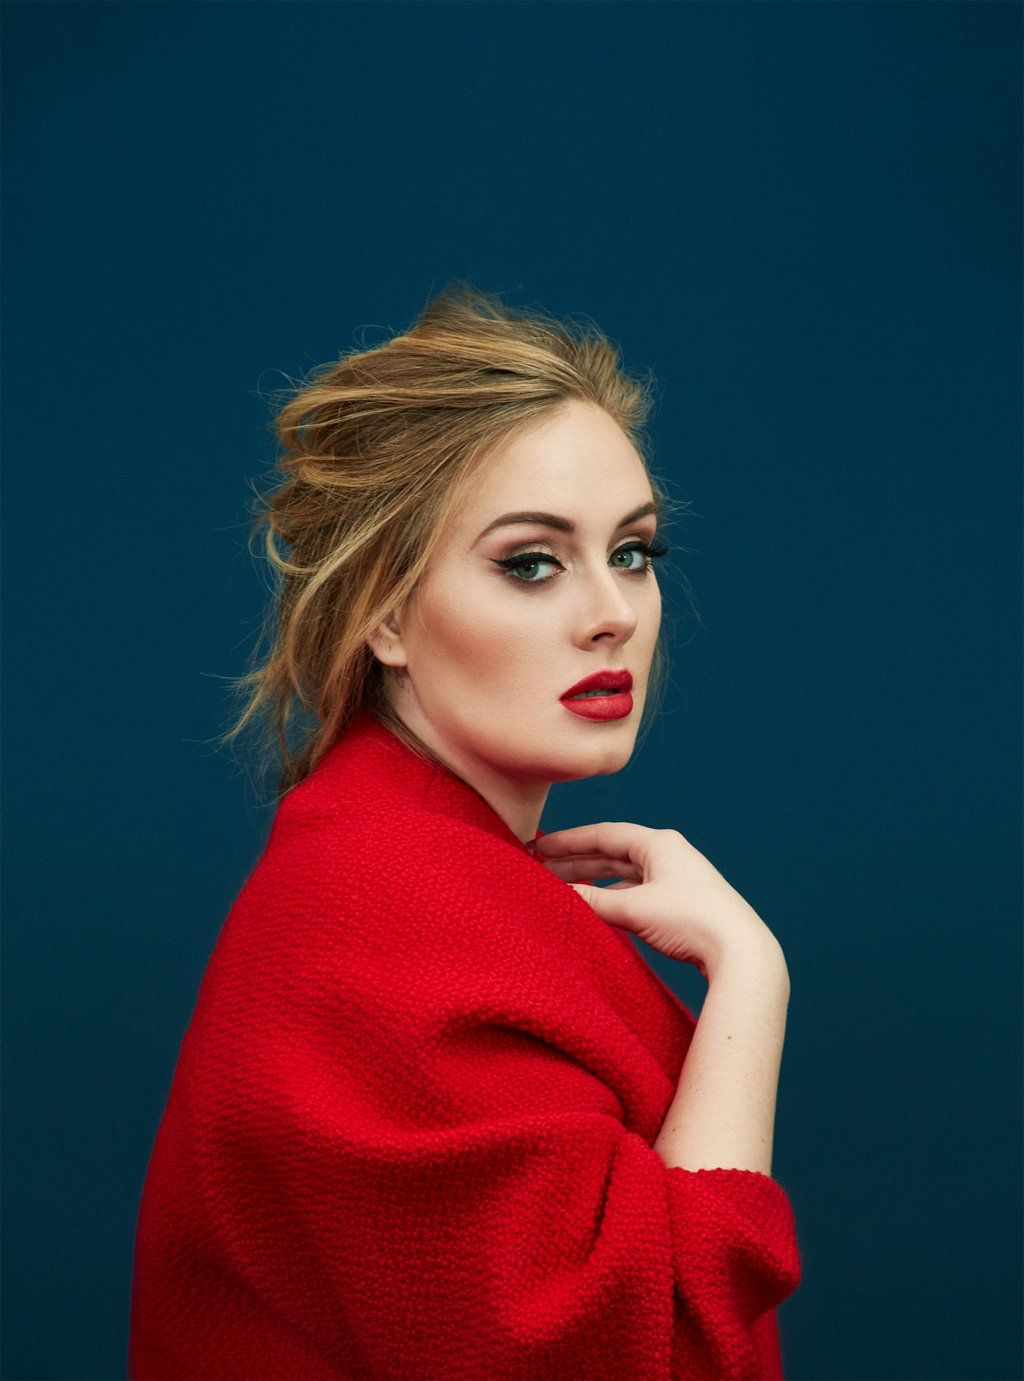 "AdeleWeb on Twitter: ""Time Magazine photoshoot. Beautiful. #Adele https://t.co/wVPK5qEkJh"""